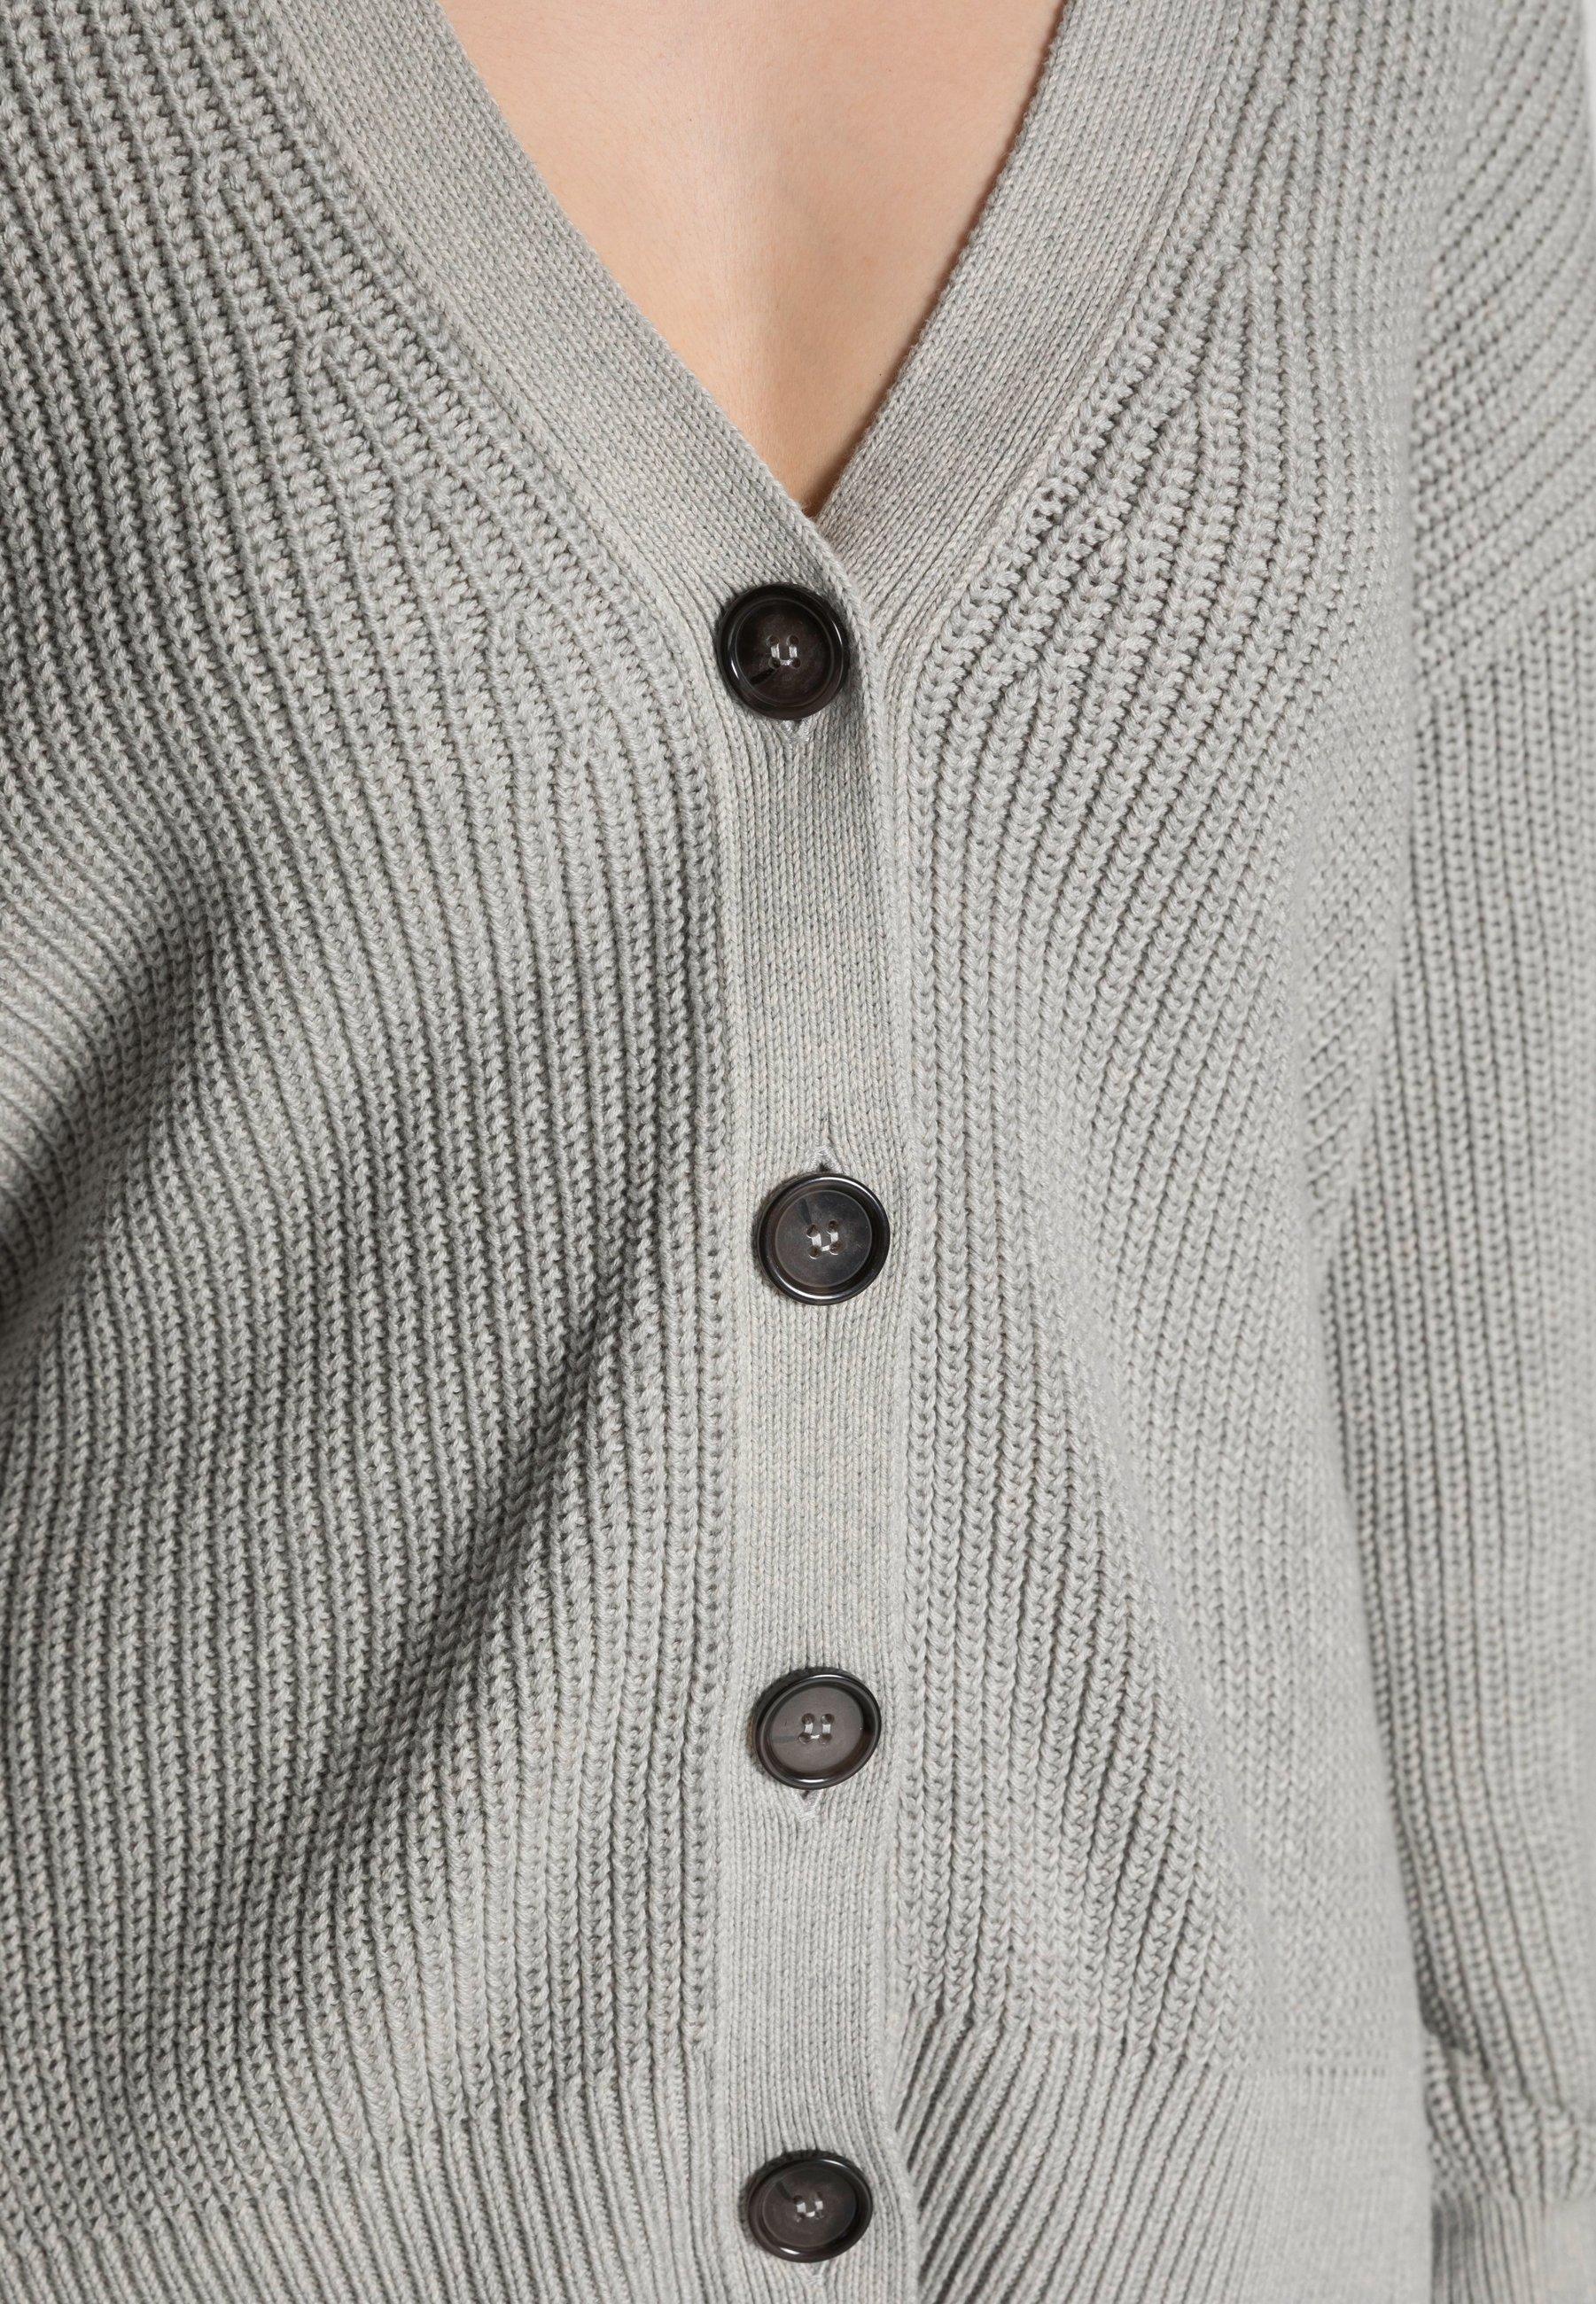 Donna CARDIGAN LONGSLEEVE V-NECK BUTTON CLOSURE - Cardigan